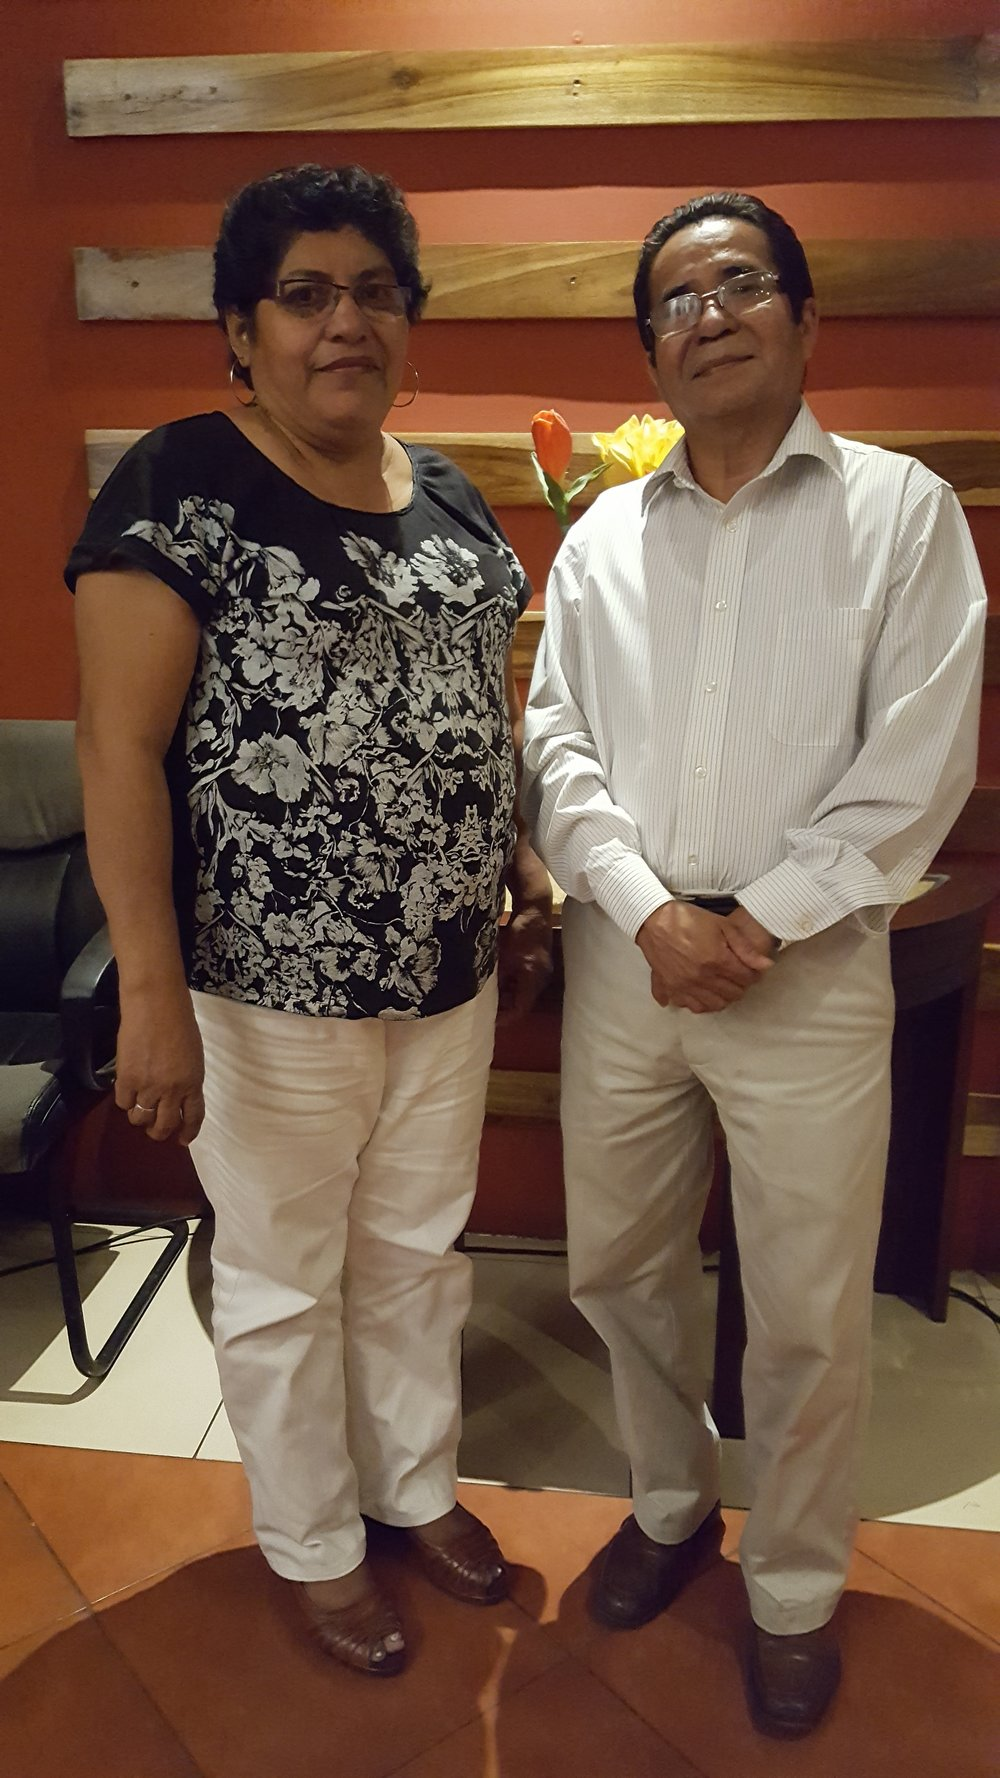 Lic. Norma Belladira Vanegas Bojorque   Administrative and Finance Commitee